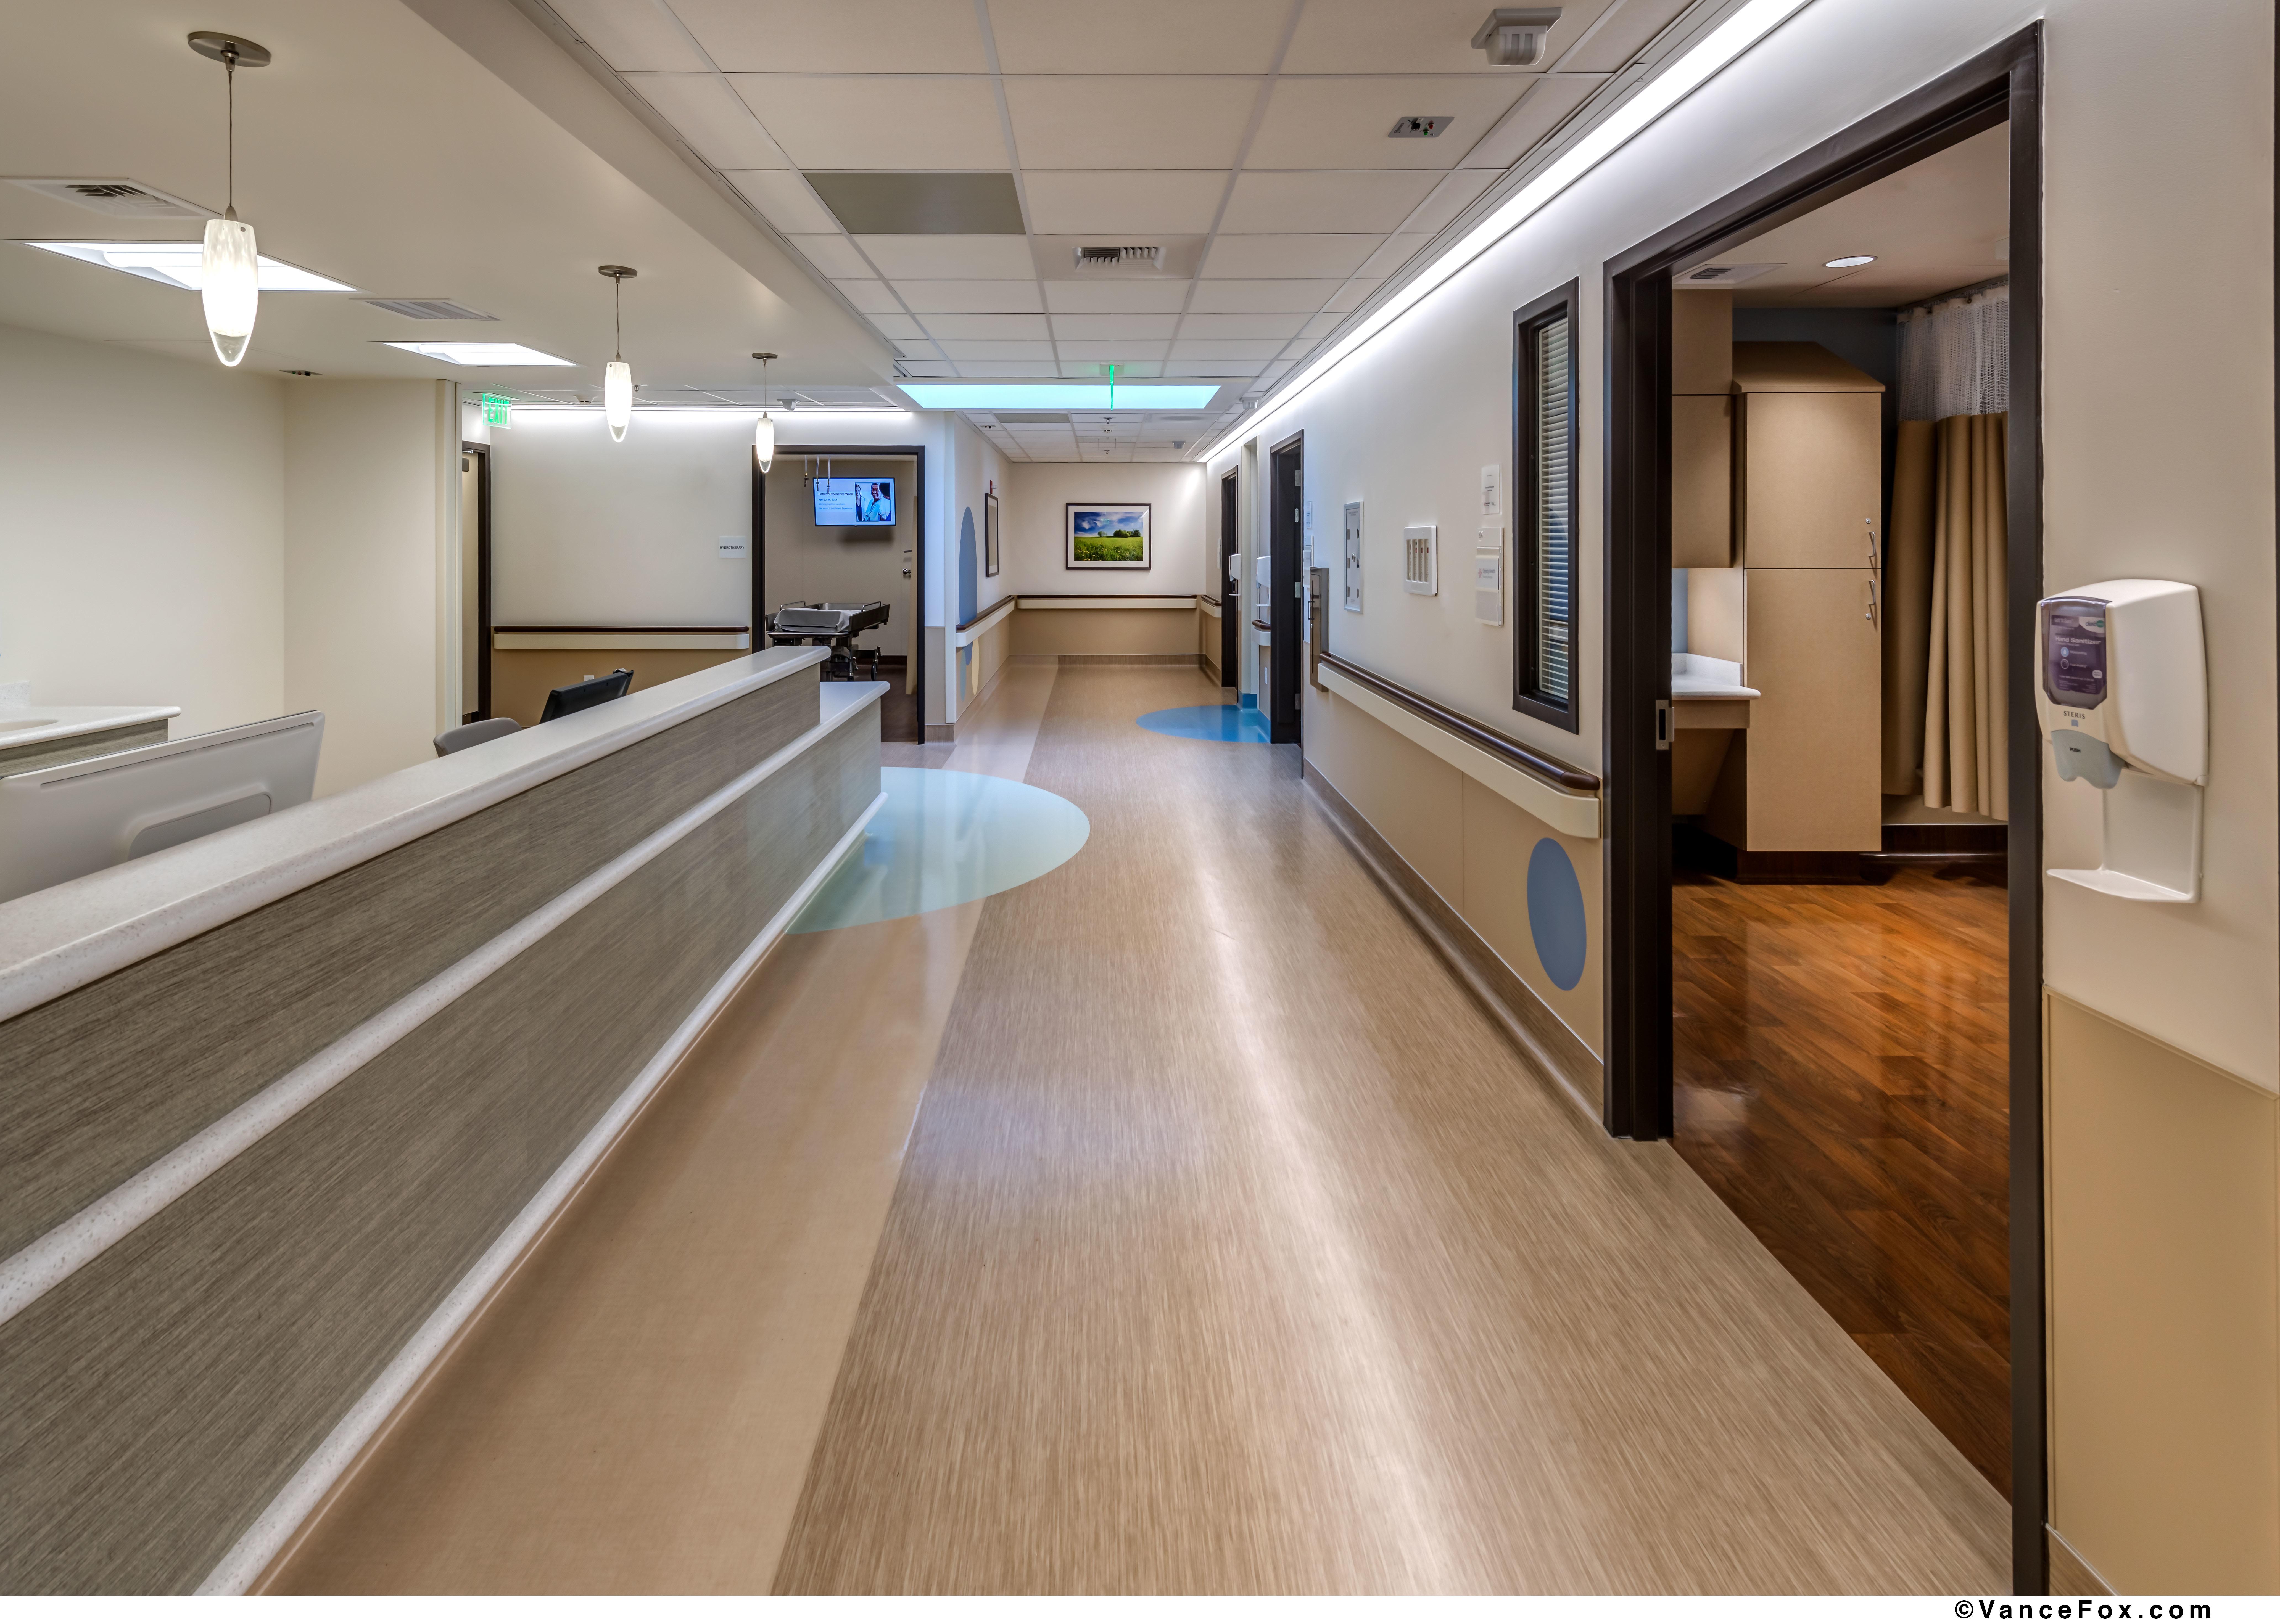 Corridor & Nurse Station